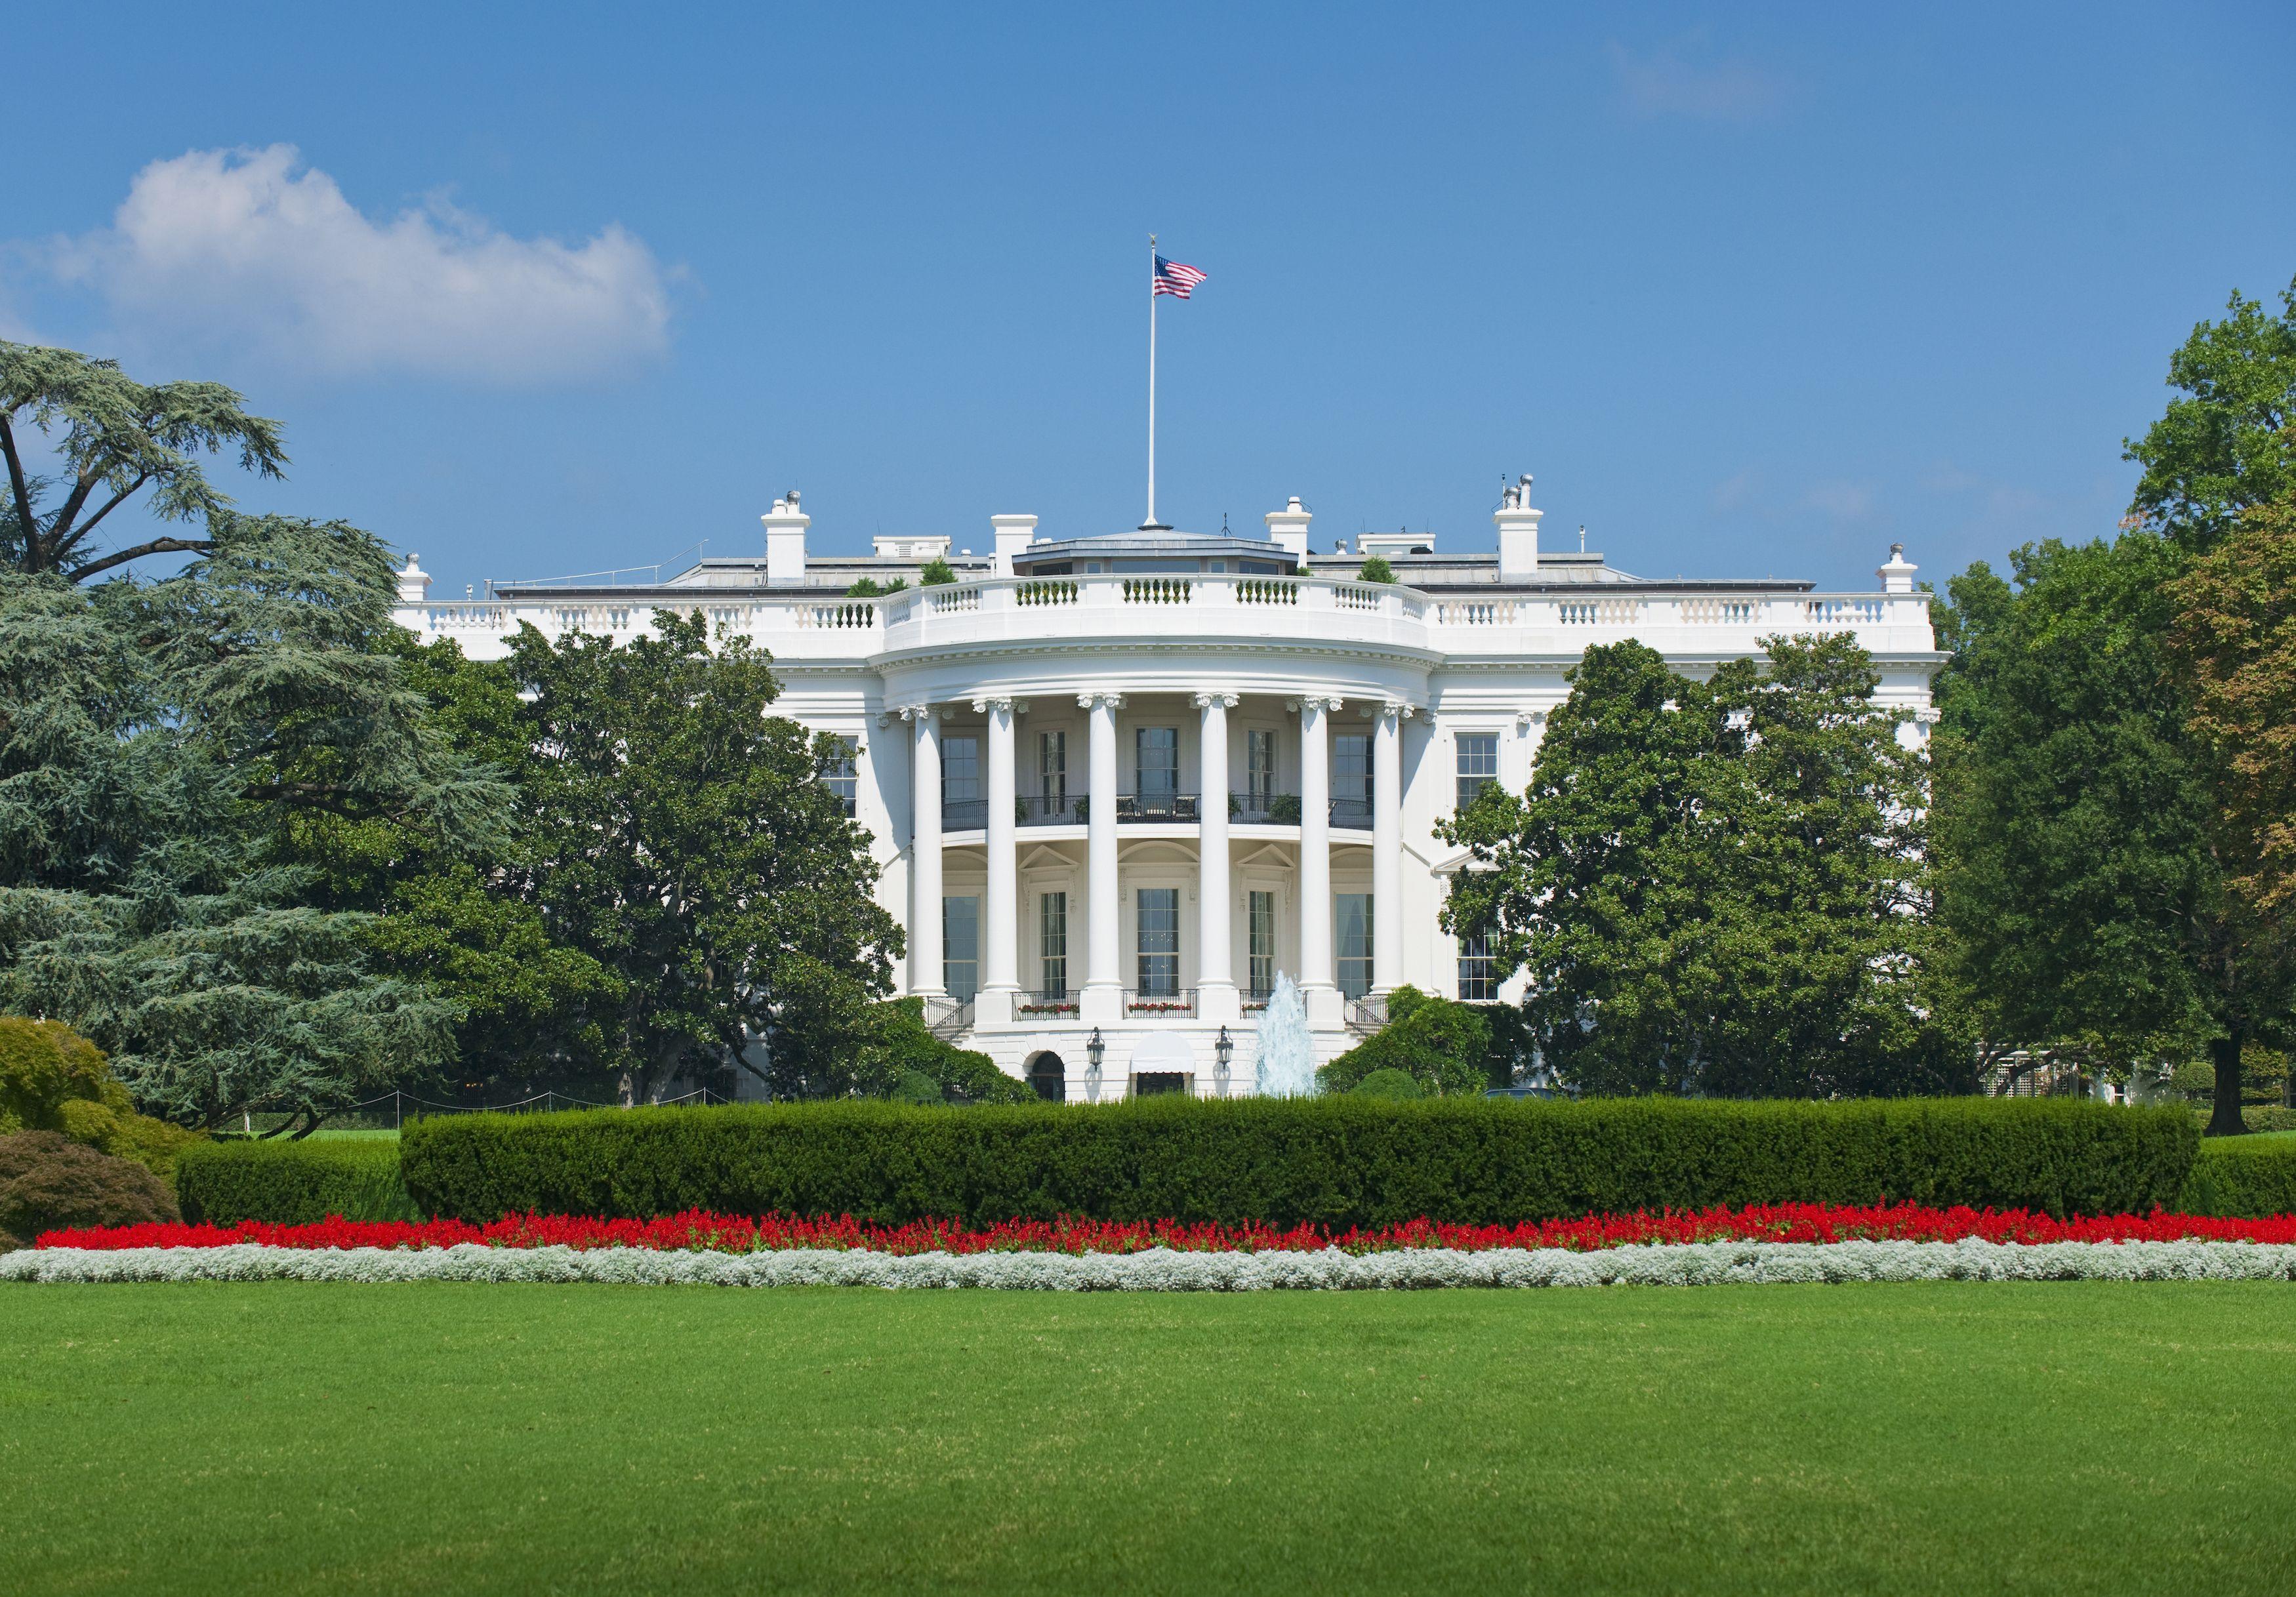 10 Famous Landmarks And Their Interesting History - American Landmarks